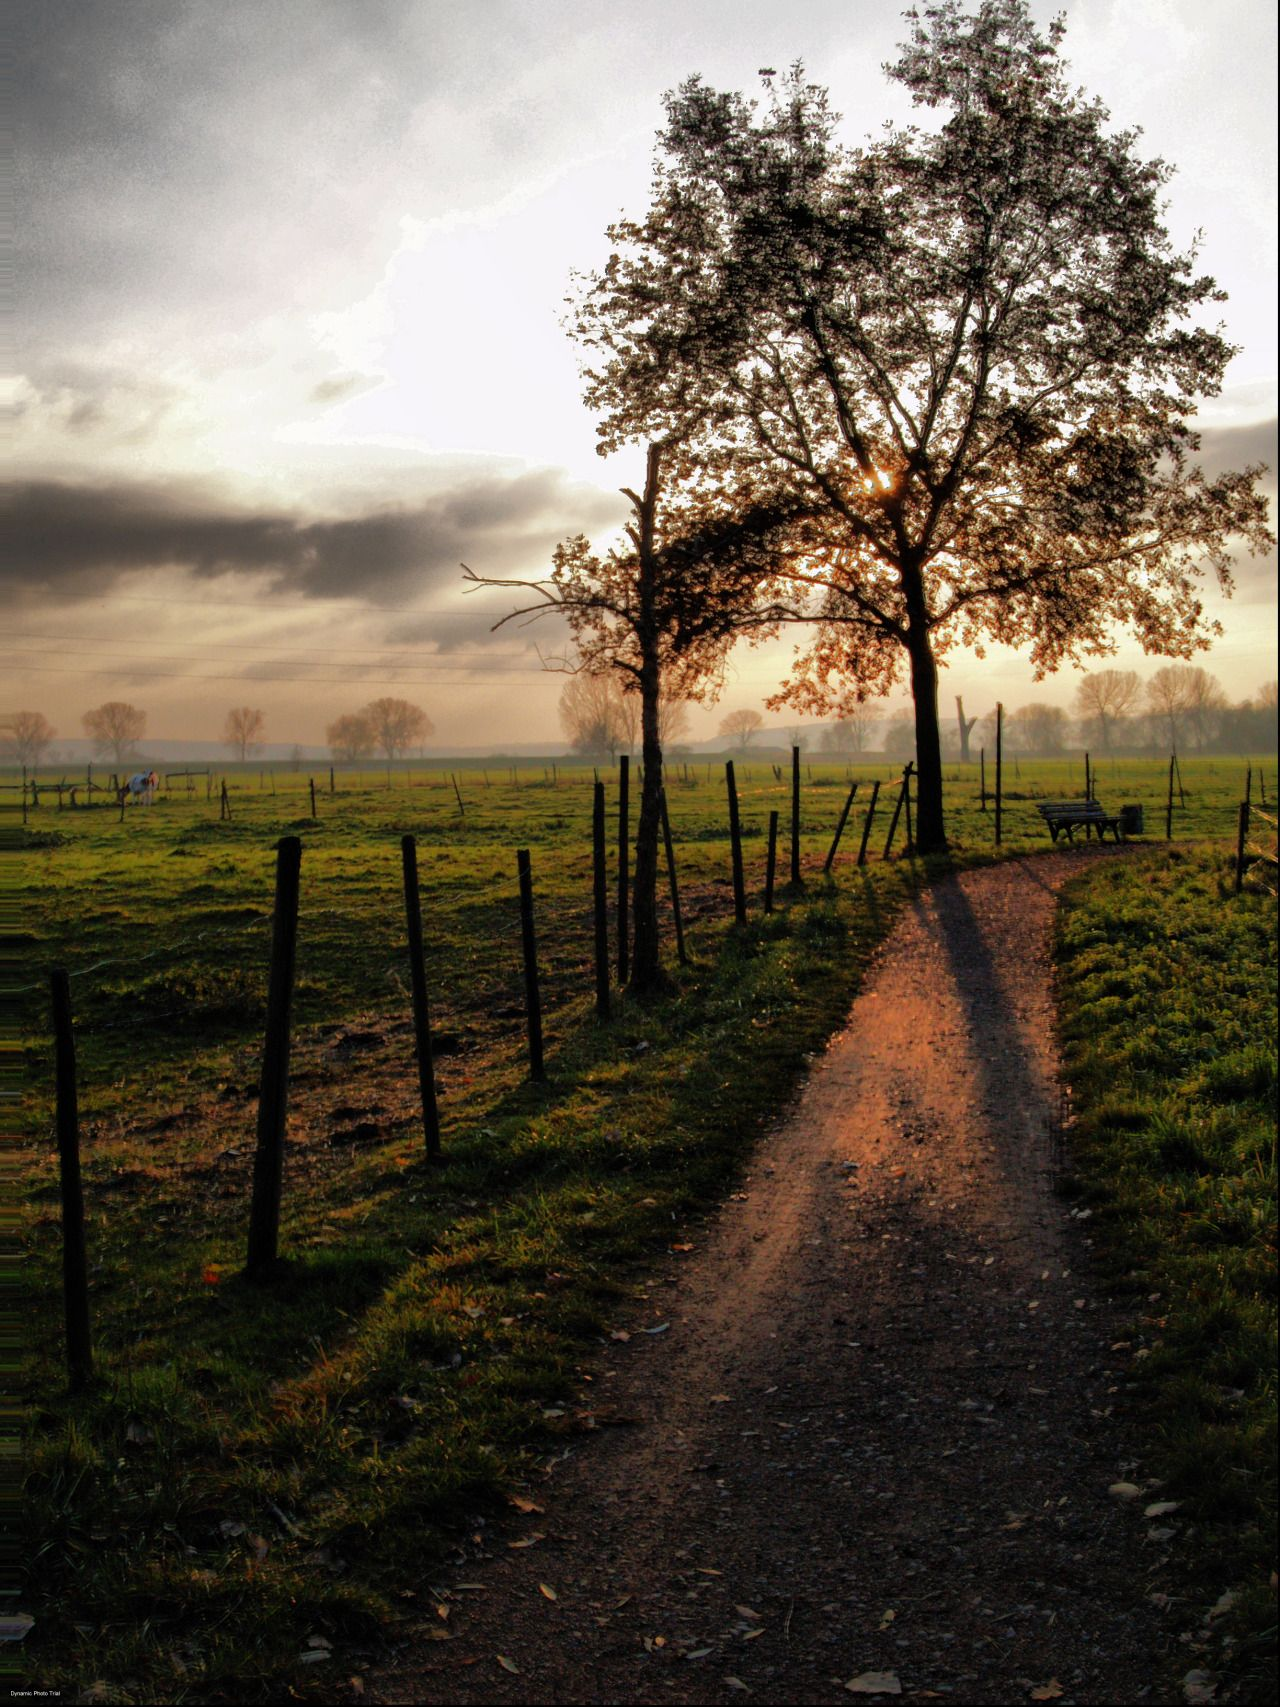 Trebur - Germany (by MIchael Gottwald)